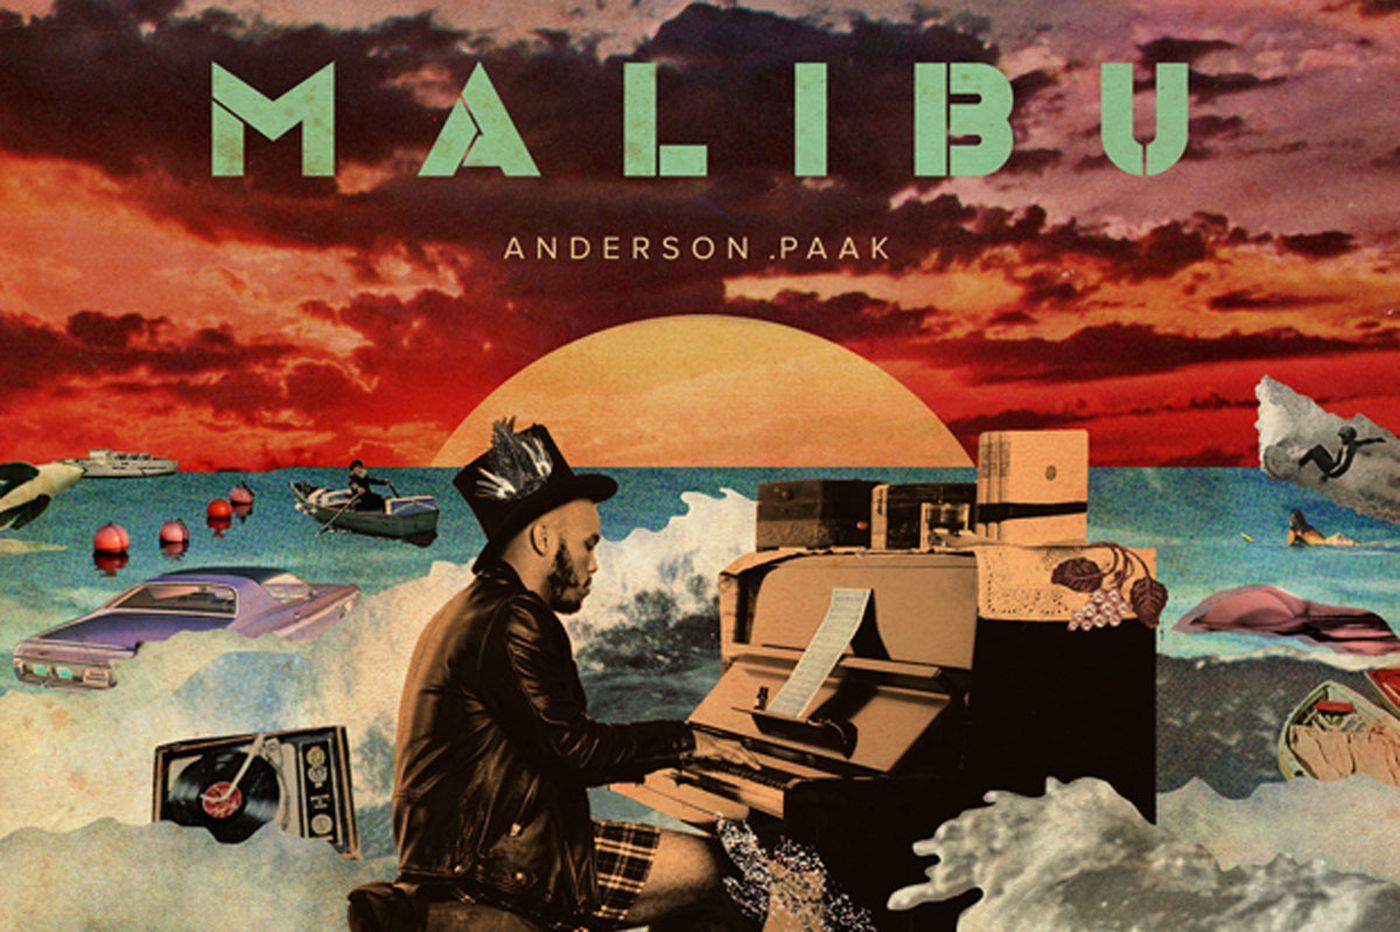 New albums: Anderson .Paak, Hank Williams Jr.